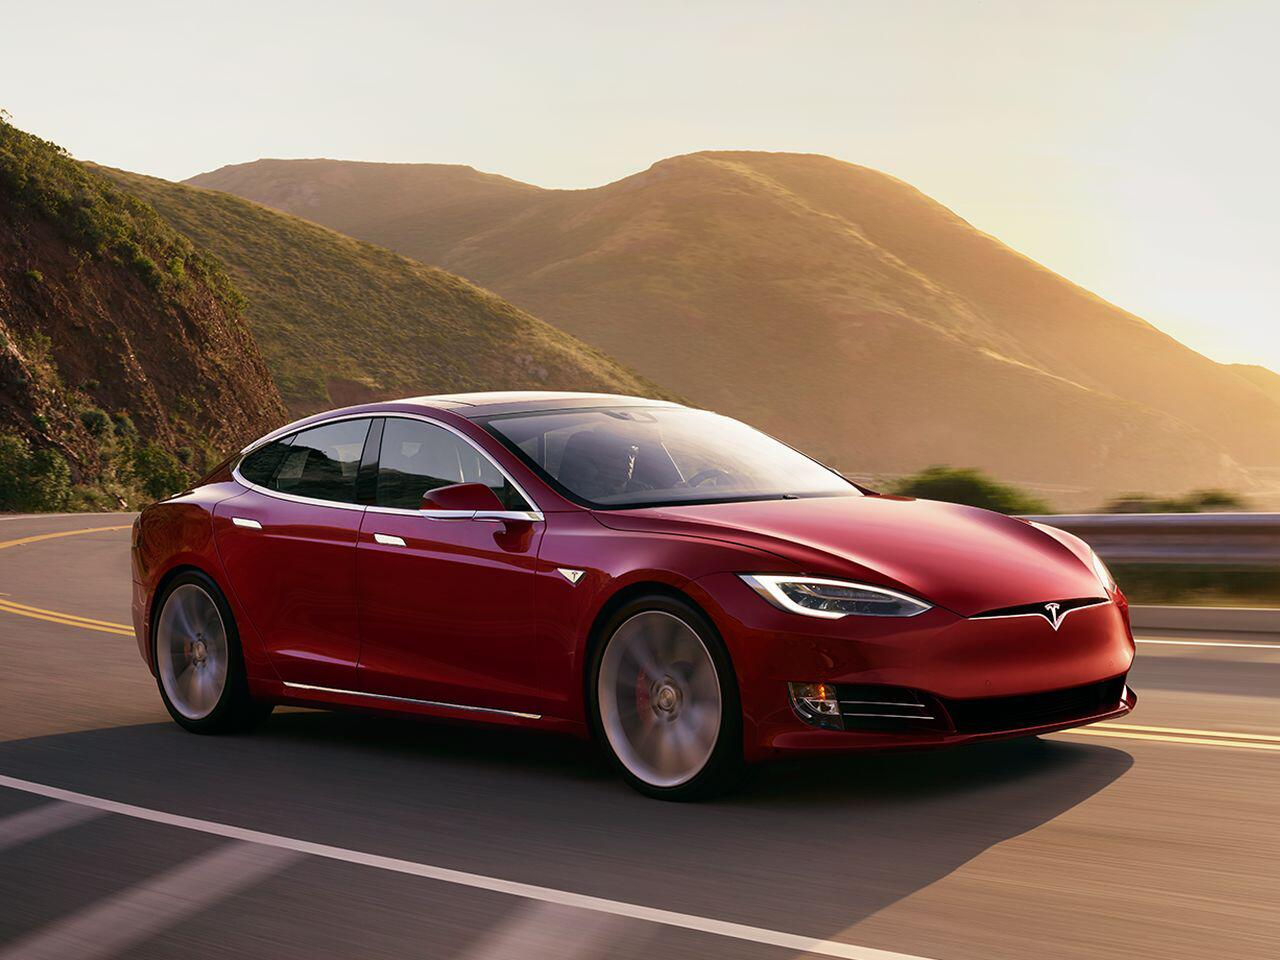 Bild zu Platz 10: Tesla Model S